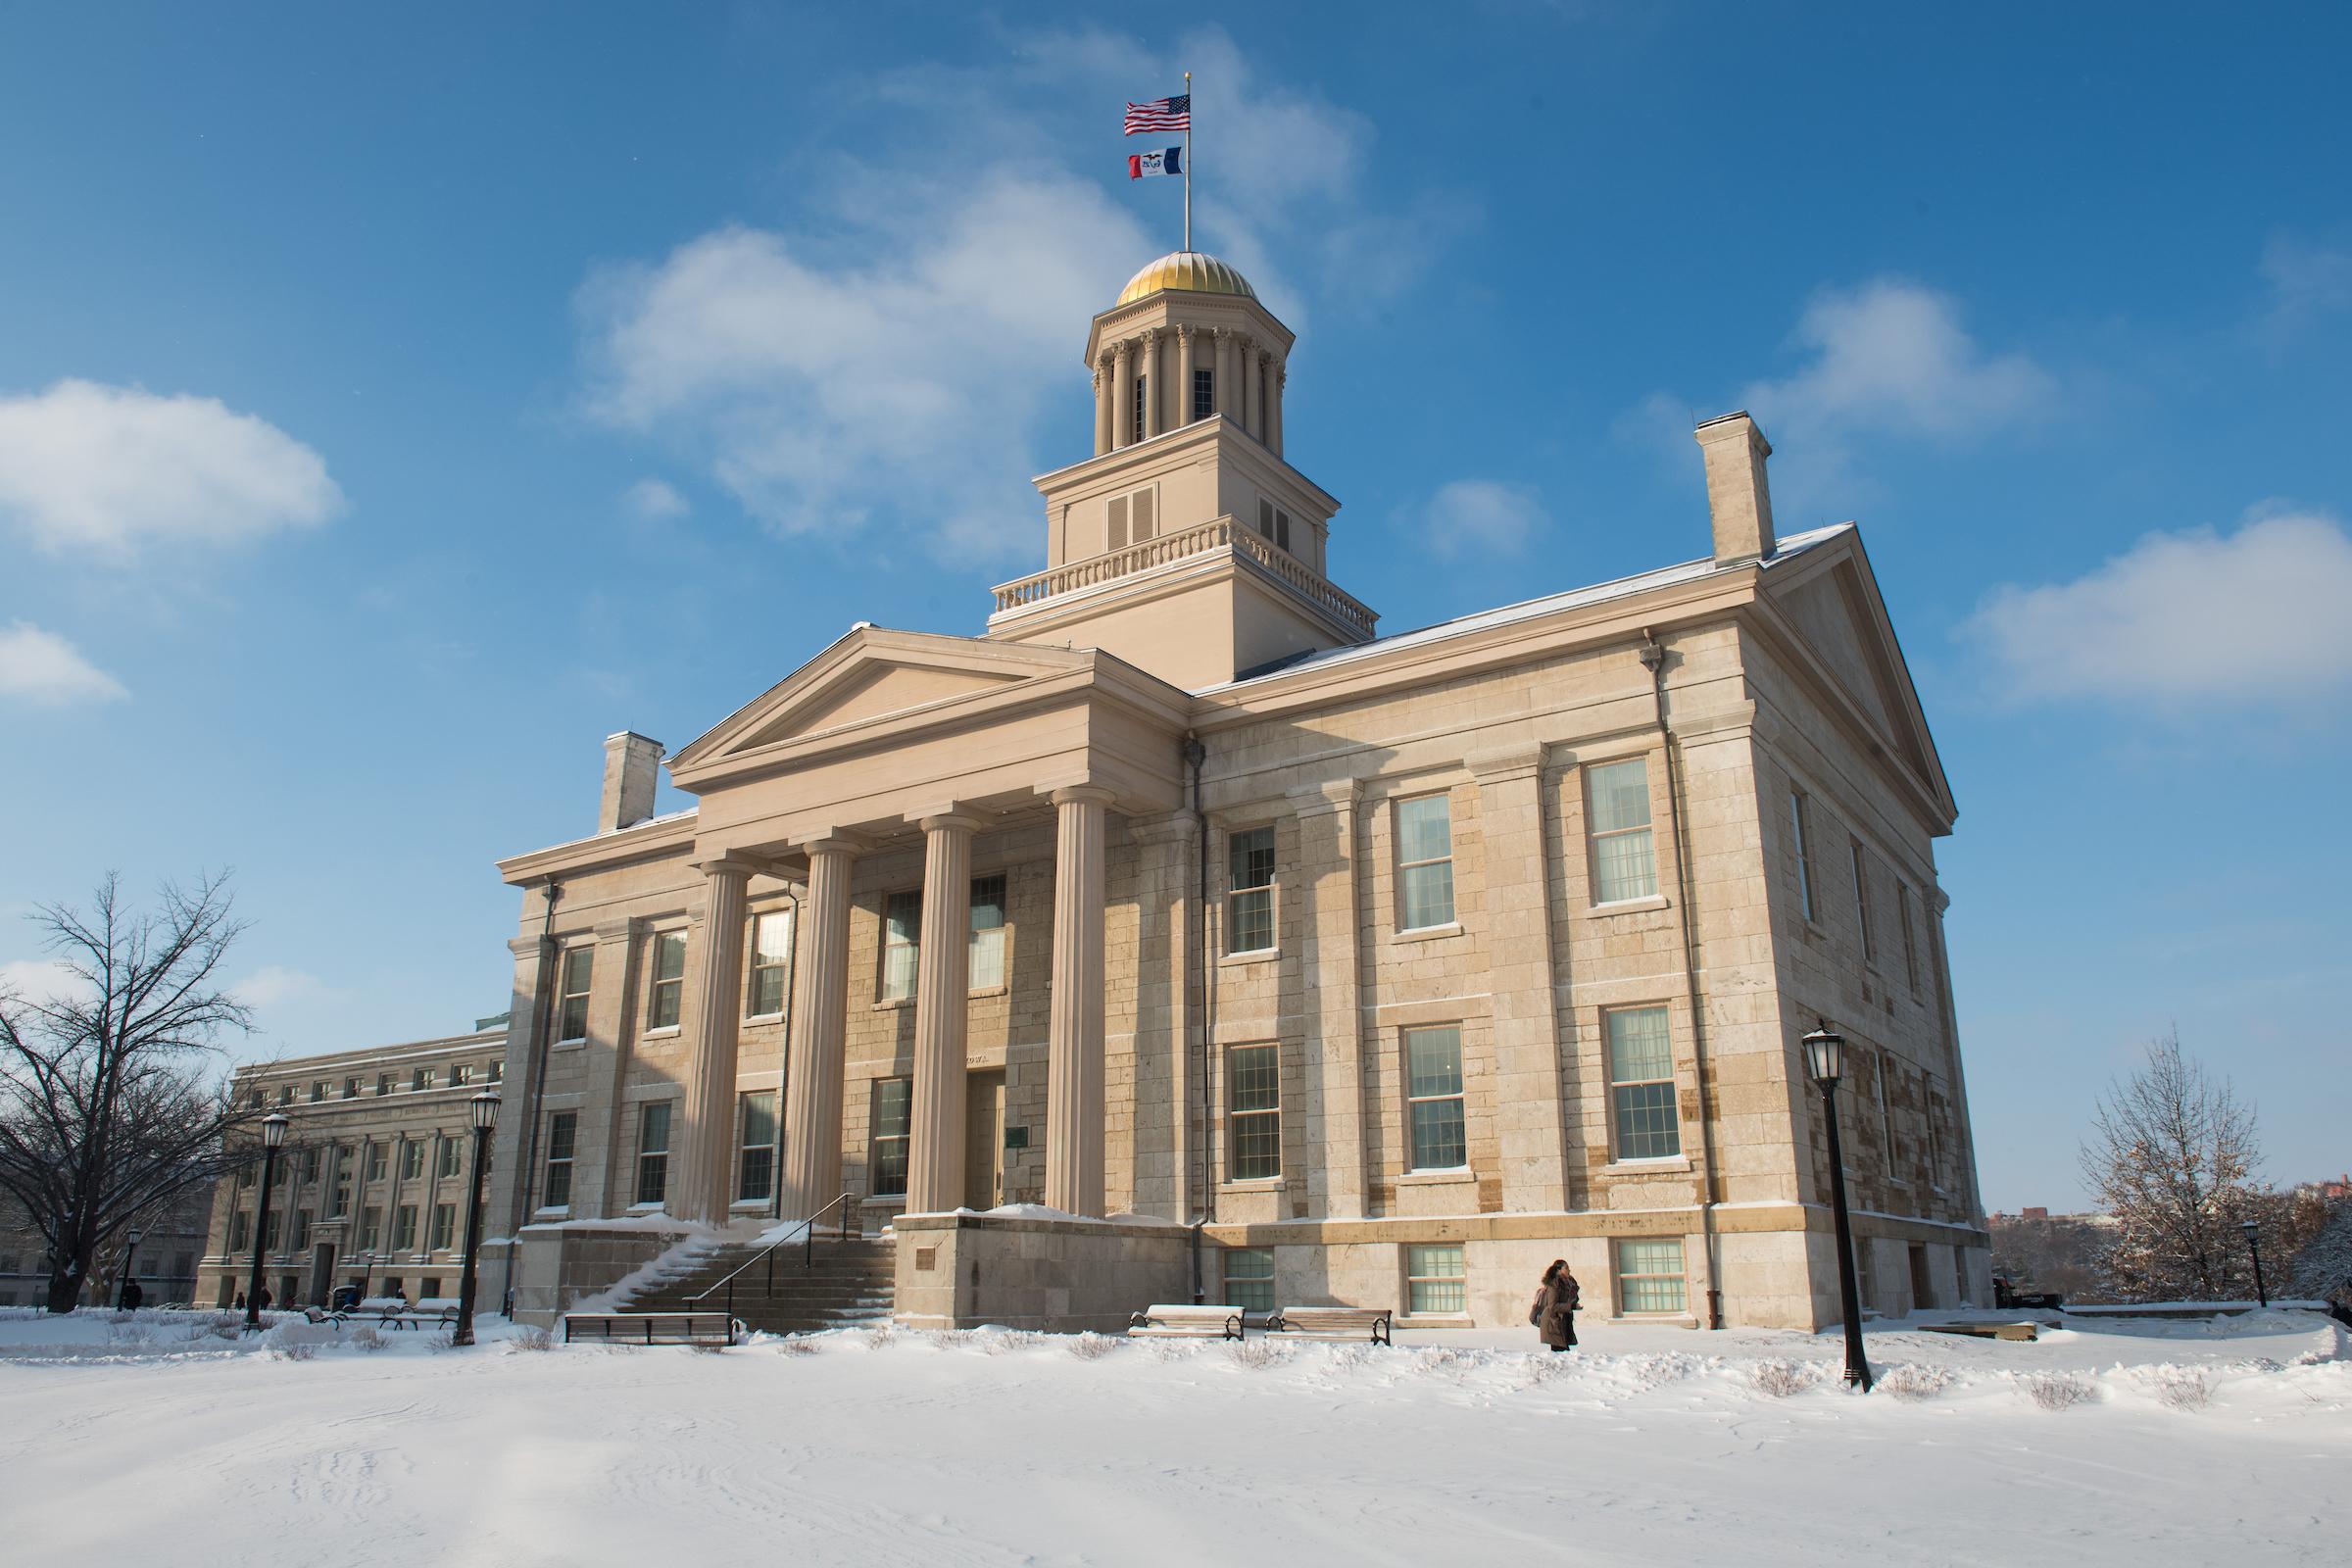 fesh snow old capitol